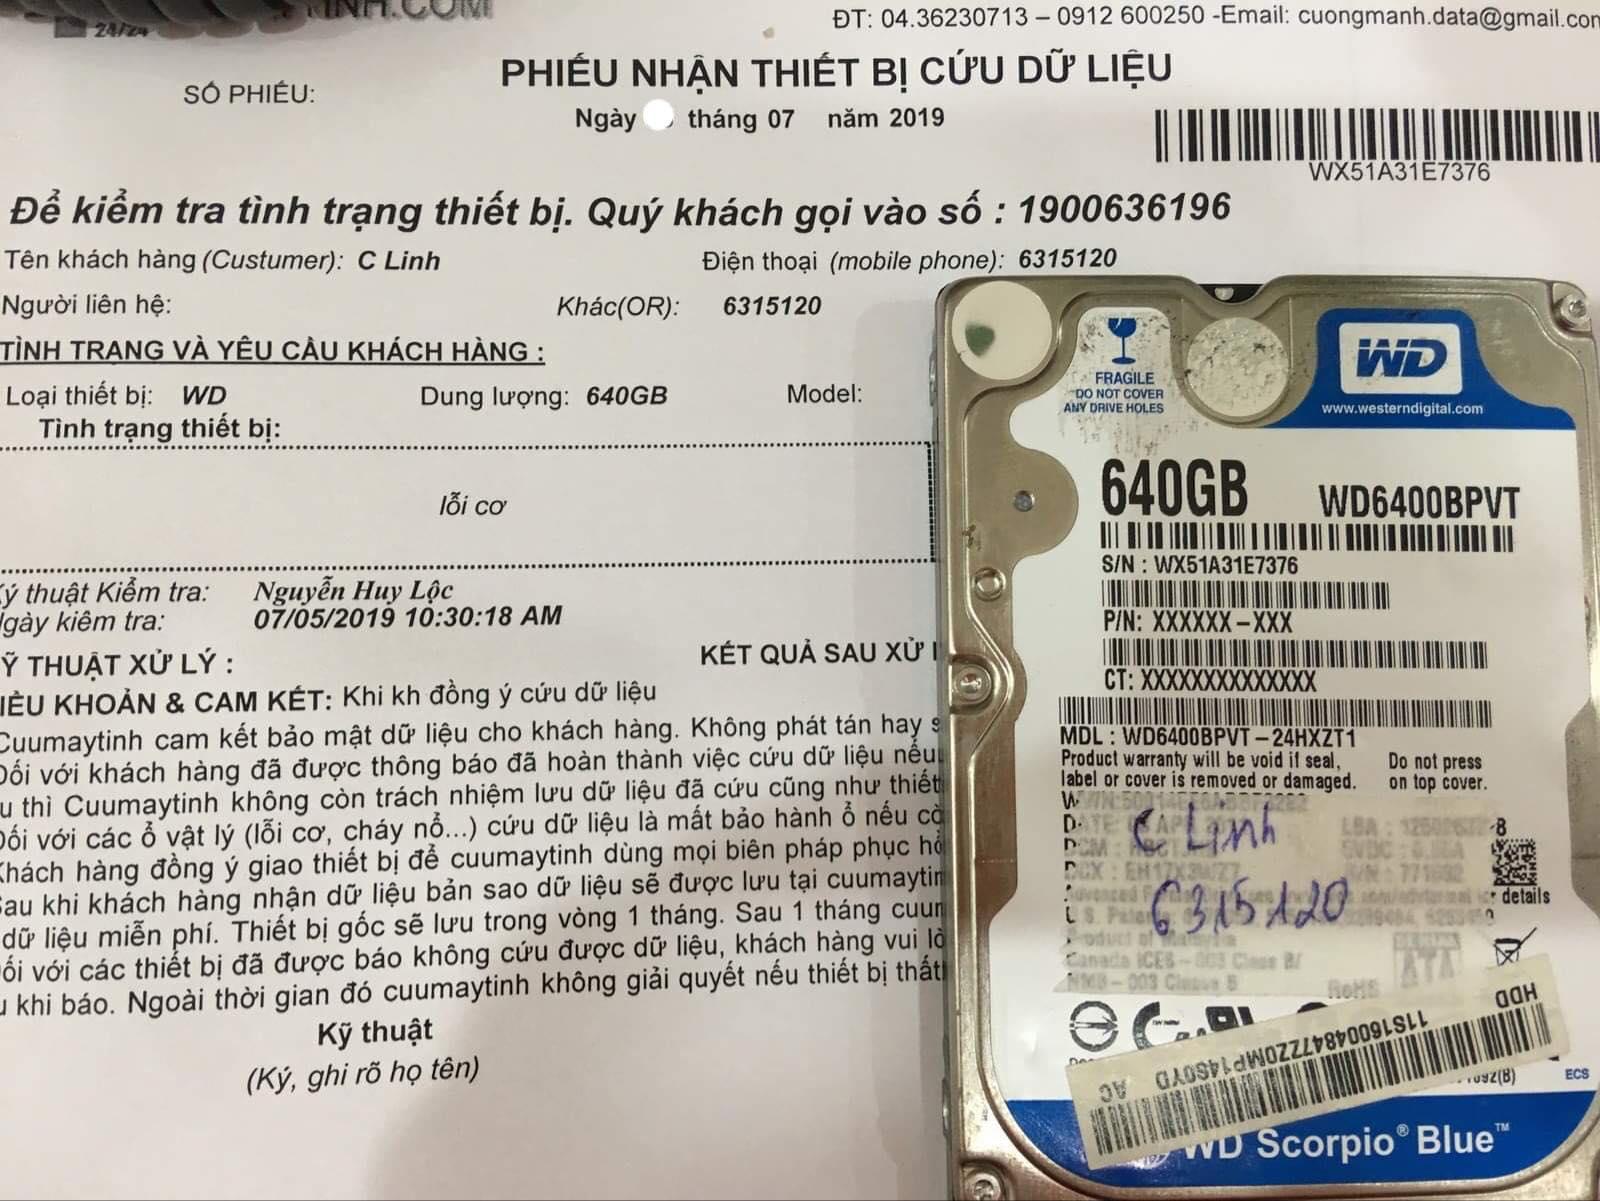 Cứu dữ liệu ổ cứng Western 640GB lỗi cơ 19/07/2019 - cuumaytinh